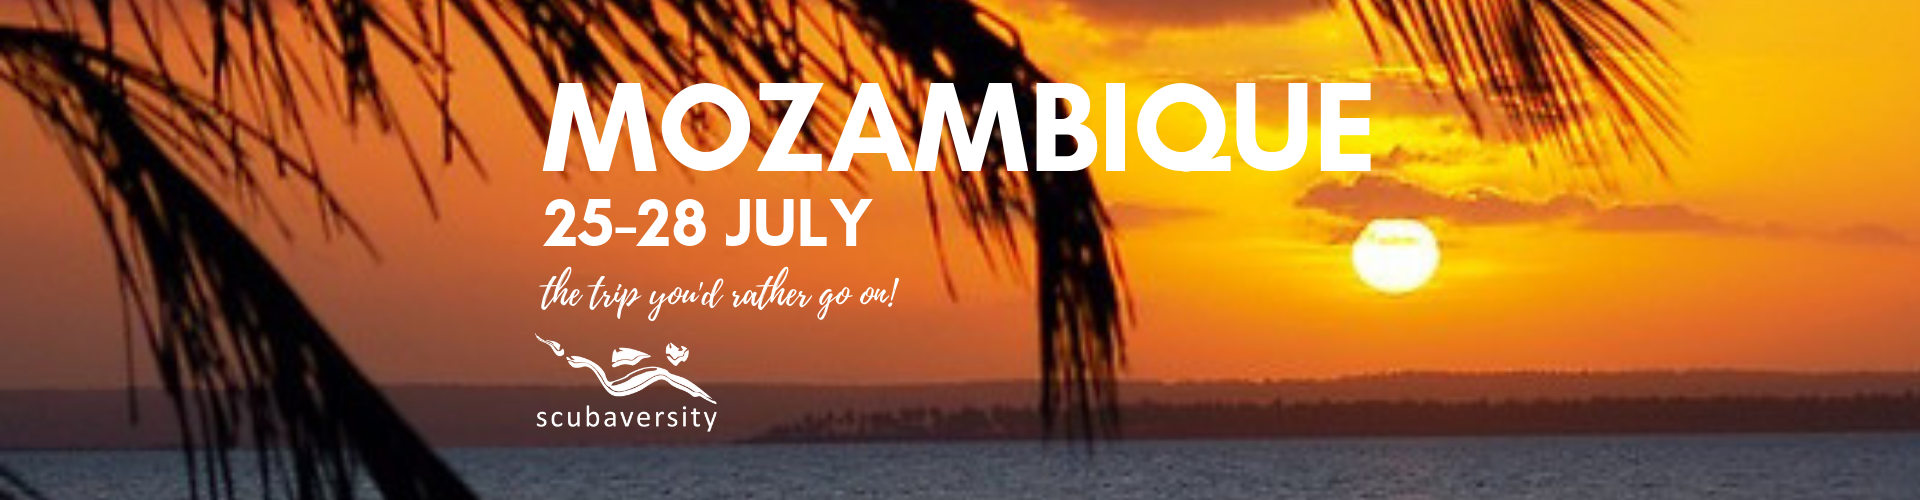 Mozambique 25 July